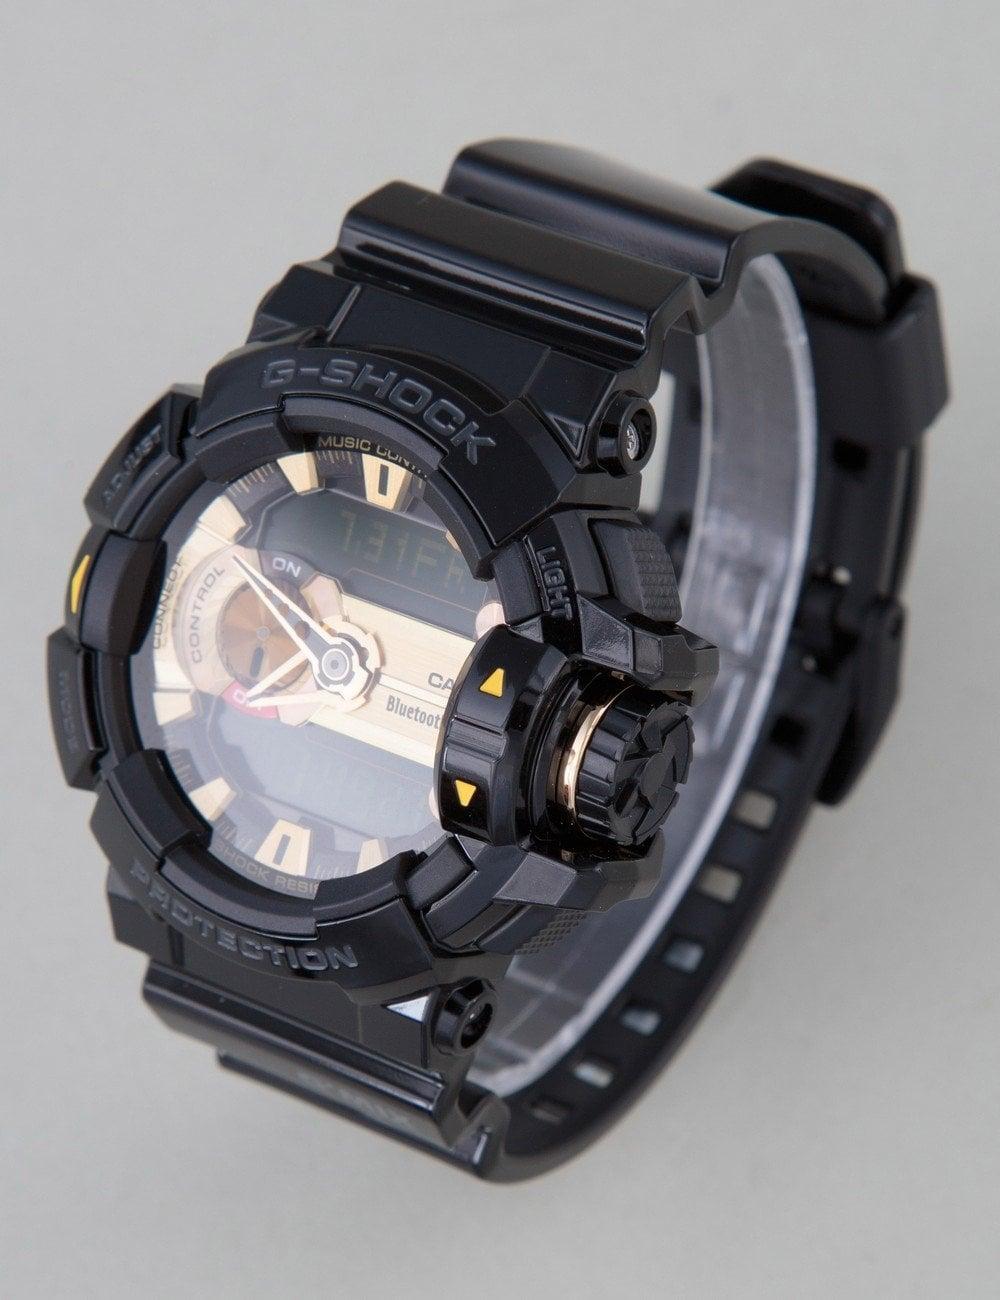 on sale 98db7 0b444 GBA-400-1A9ER Watch - Black/Gold